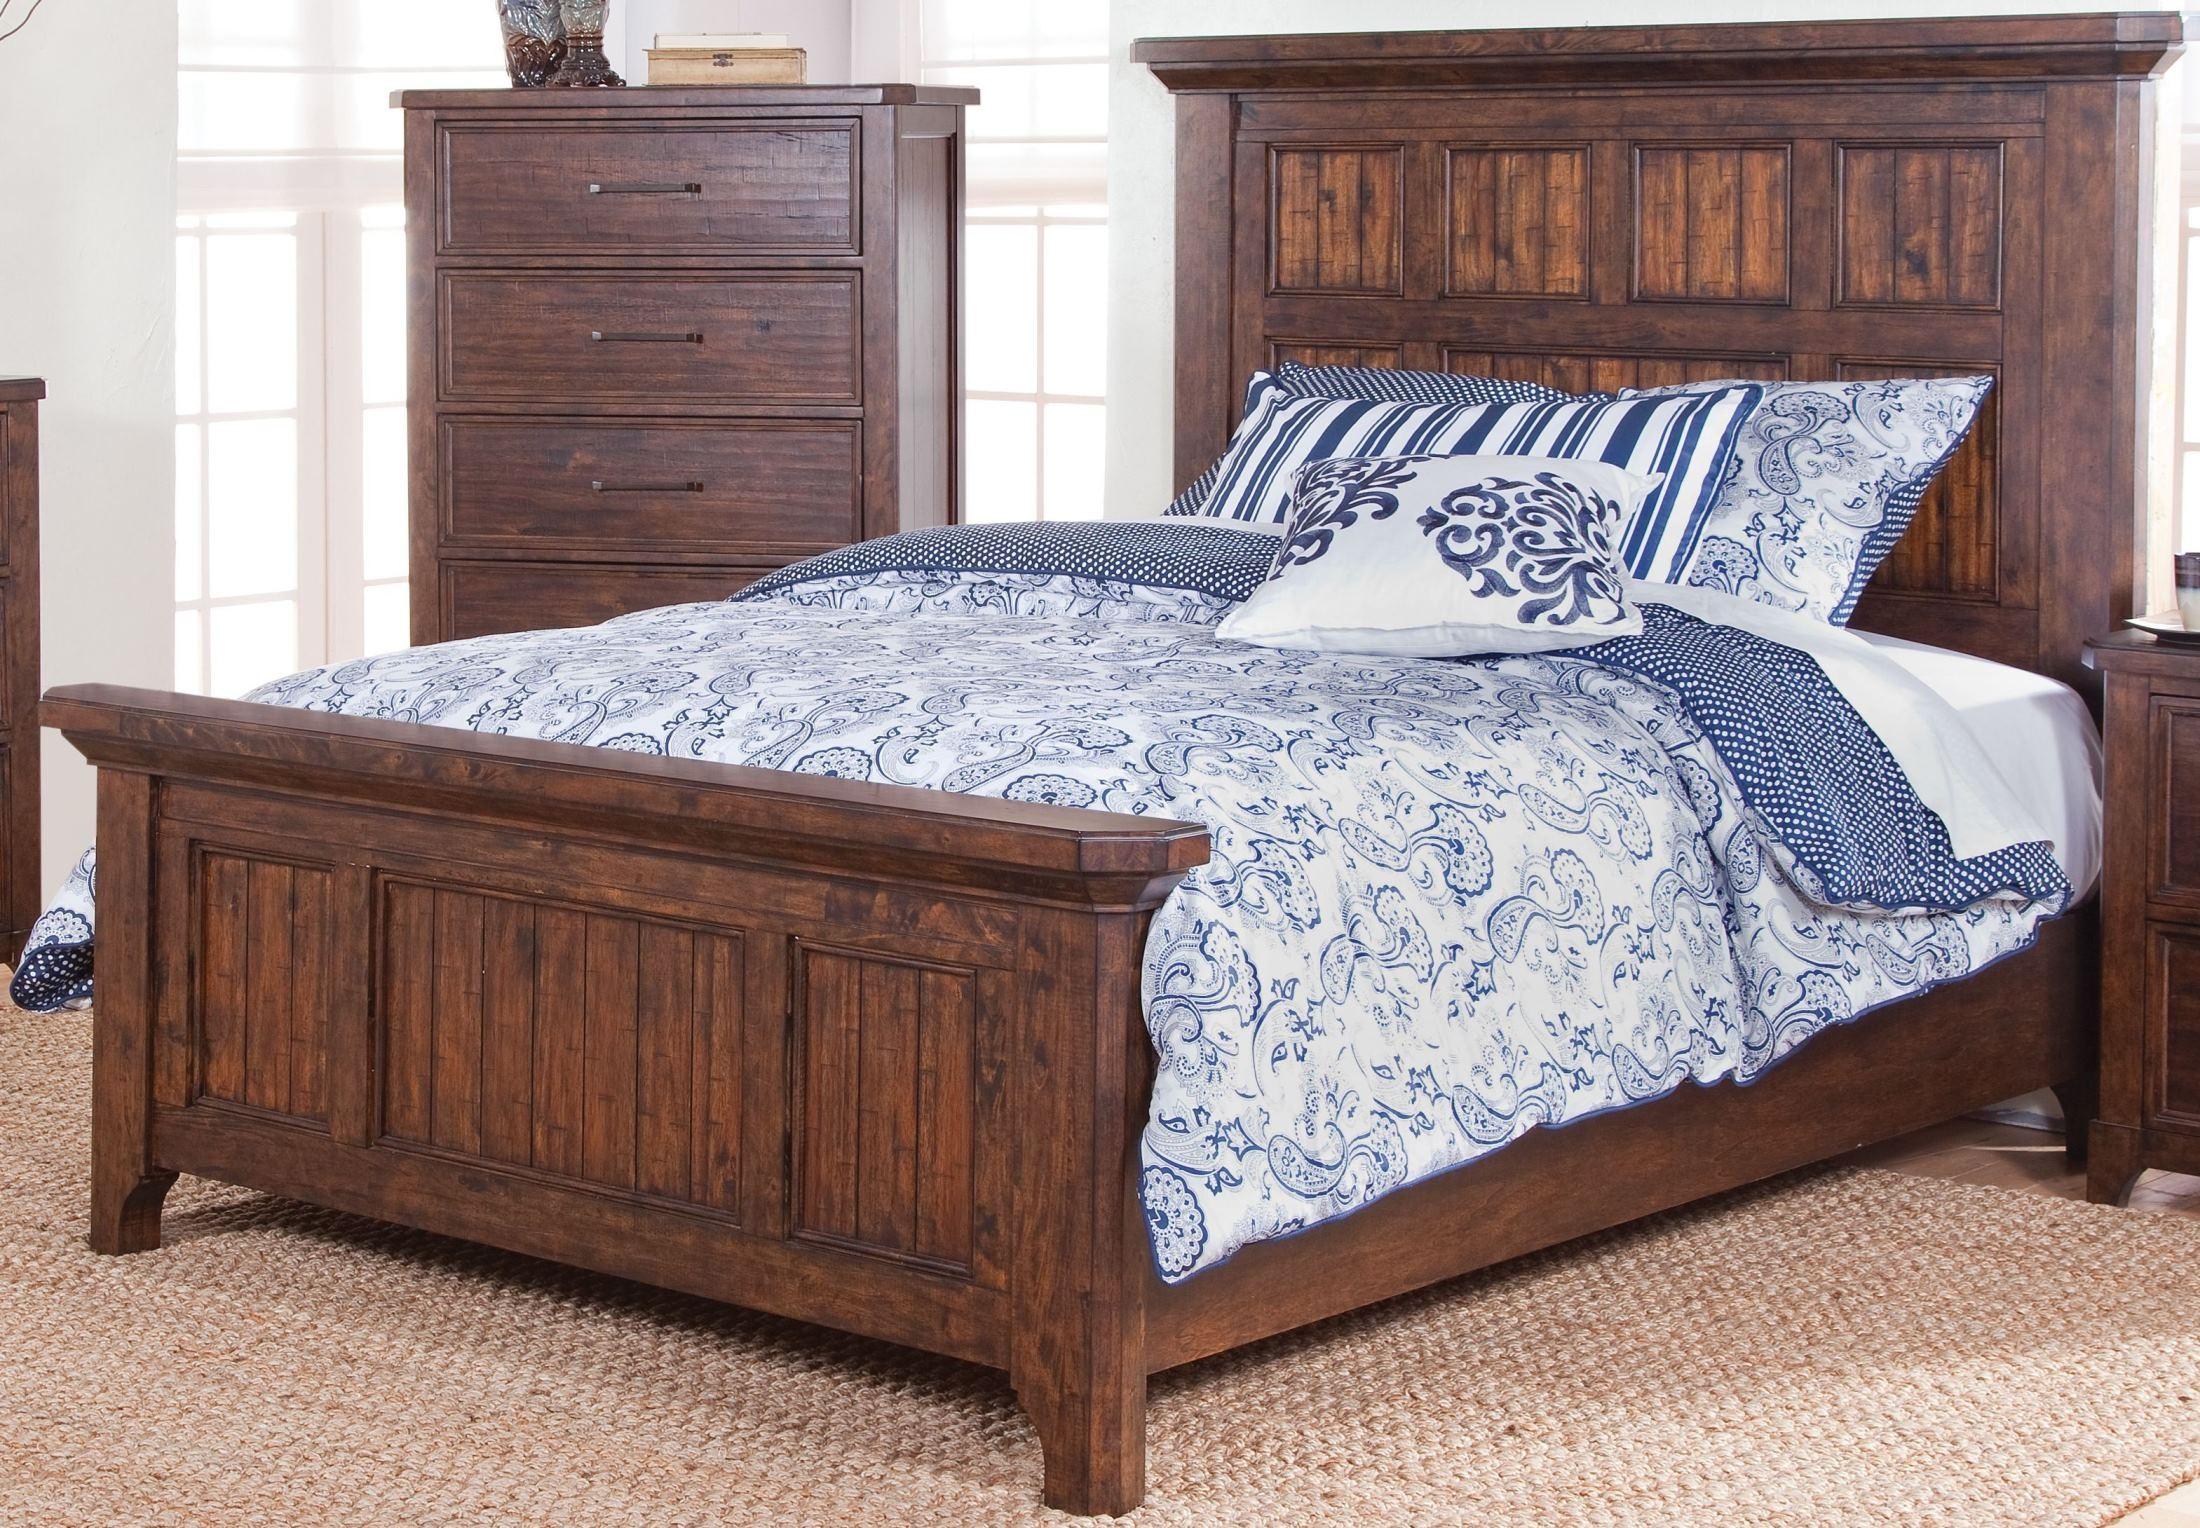 Kittredge Ranchero Distressed Panel Bedroom Set B0360 310 320 330 New Classics